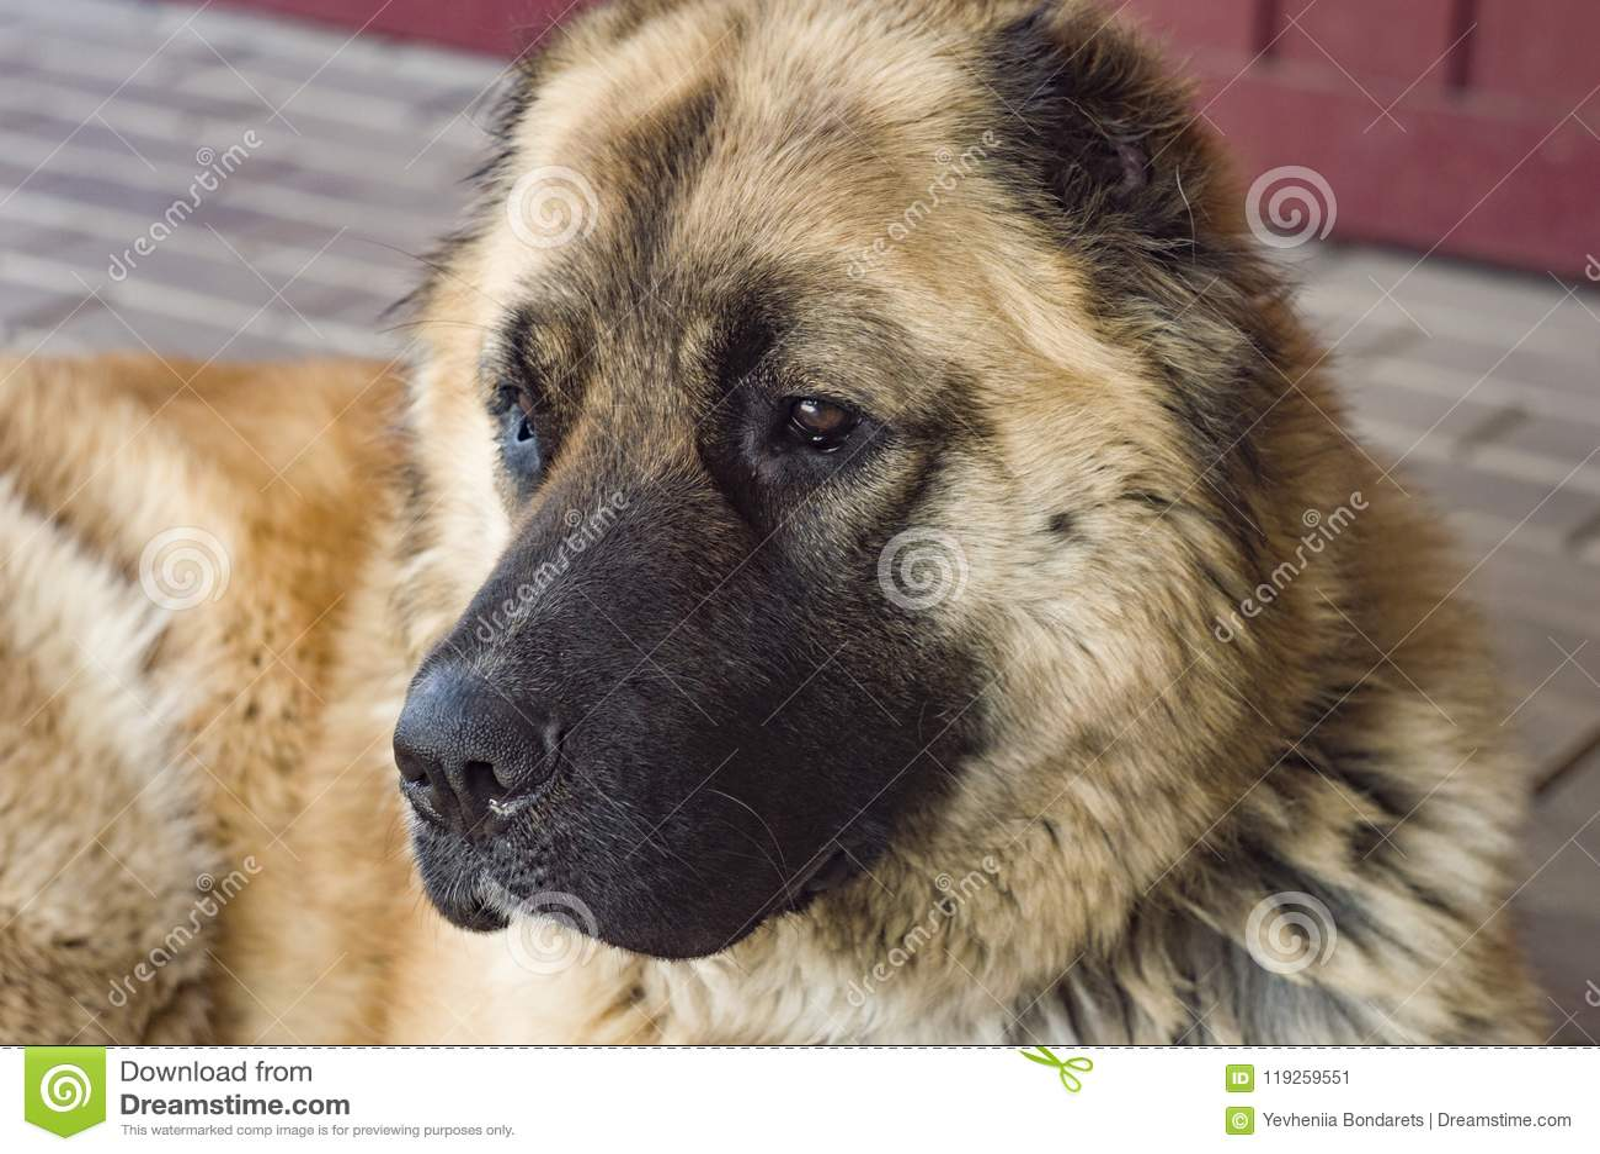 Hond Kaukasische herdershond twee jaar oude jpg